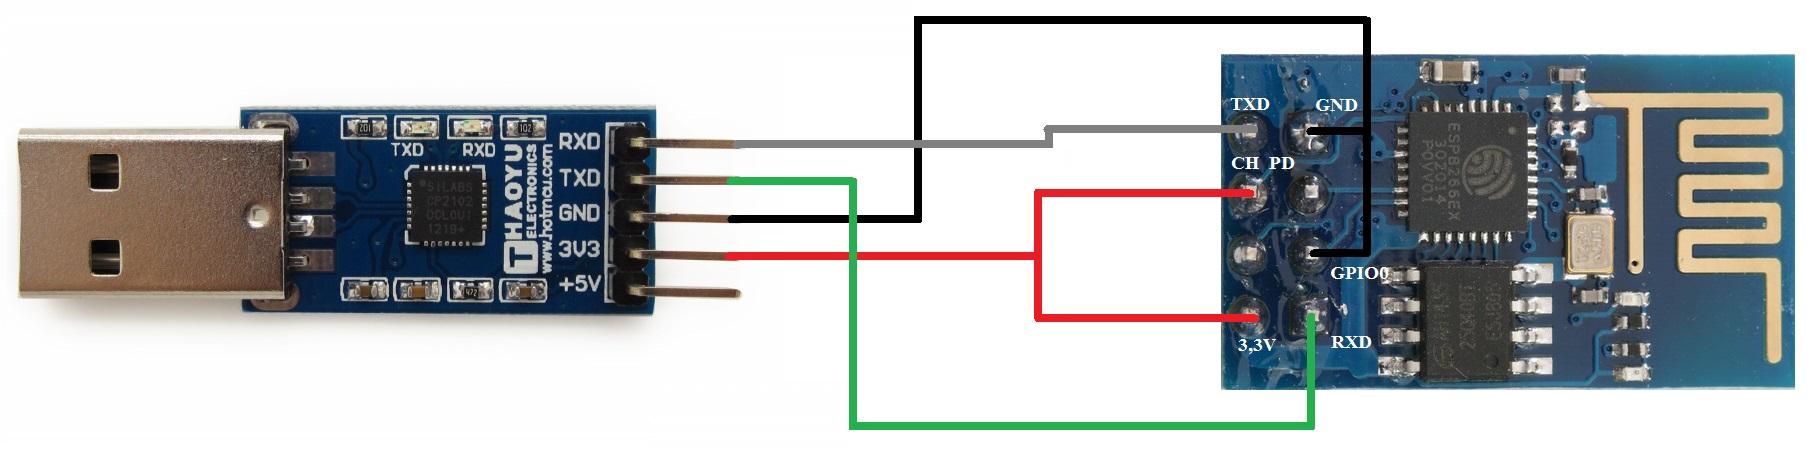 Conetando modulo wifi a USB